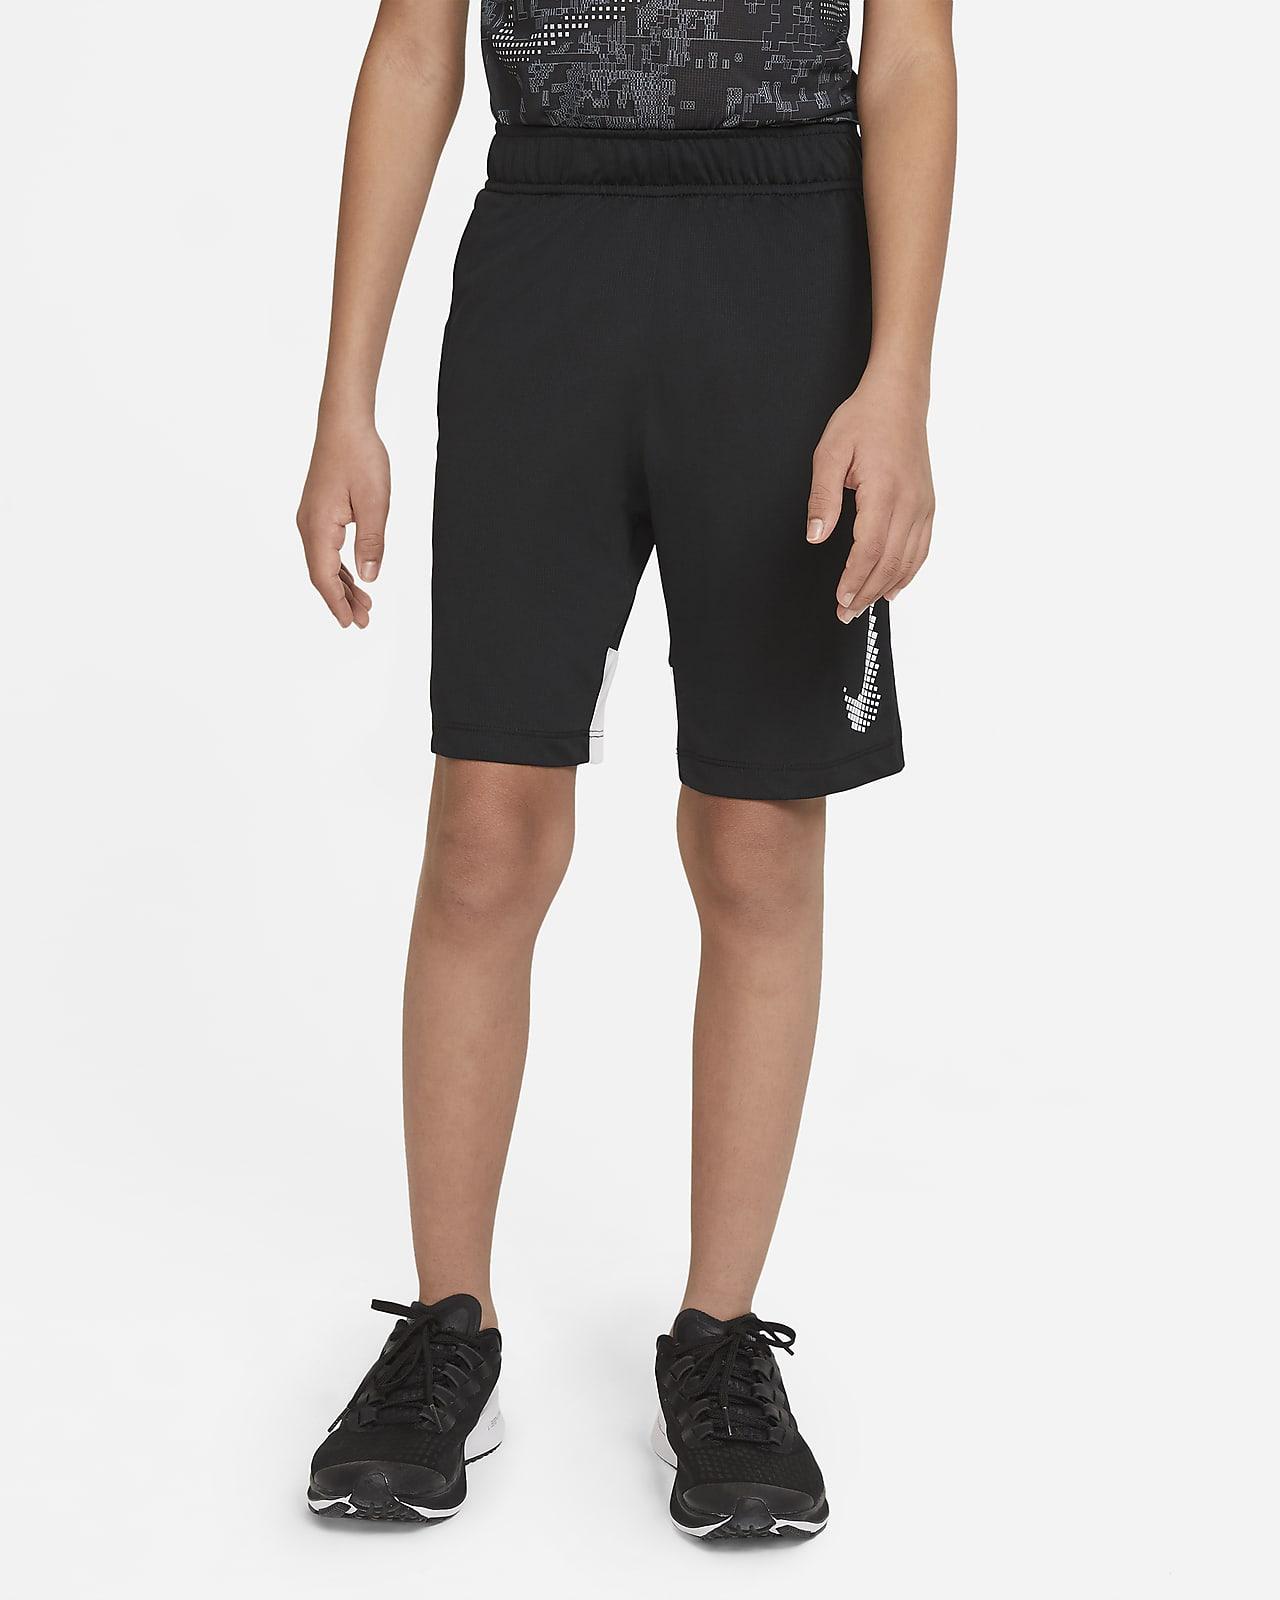 Nike Dominate Graphic Older Kids' (Boys') Shorts